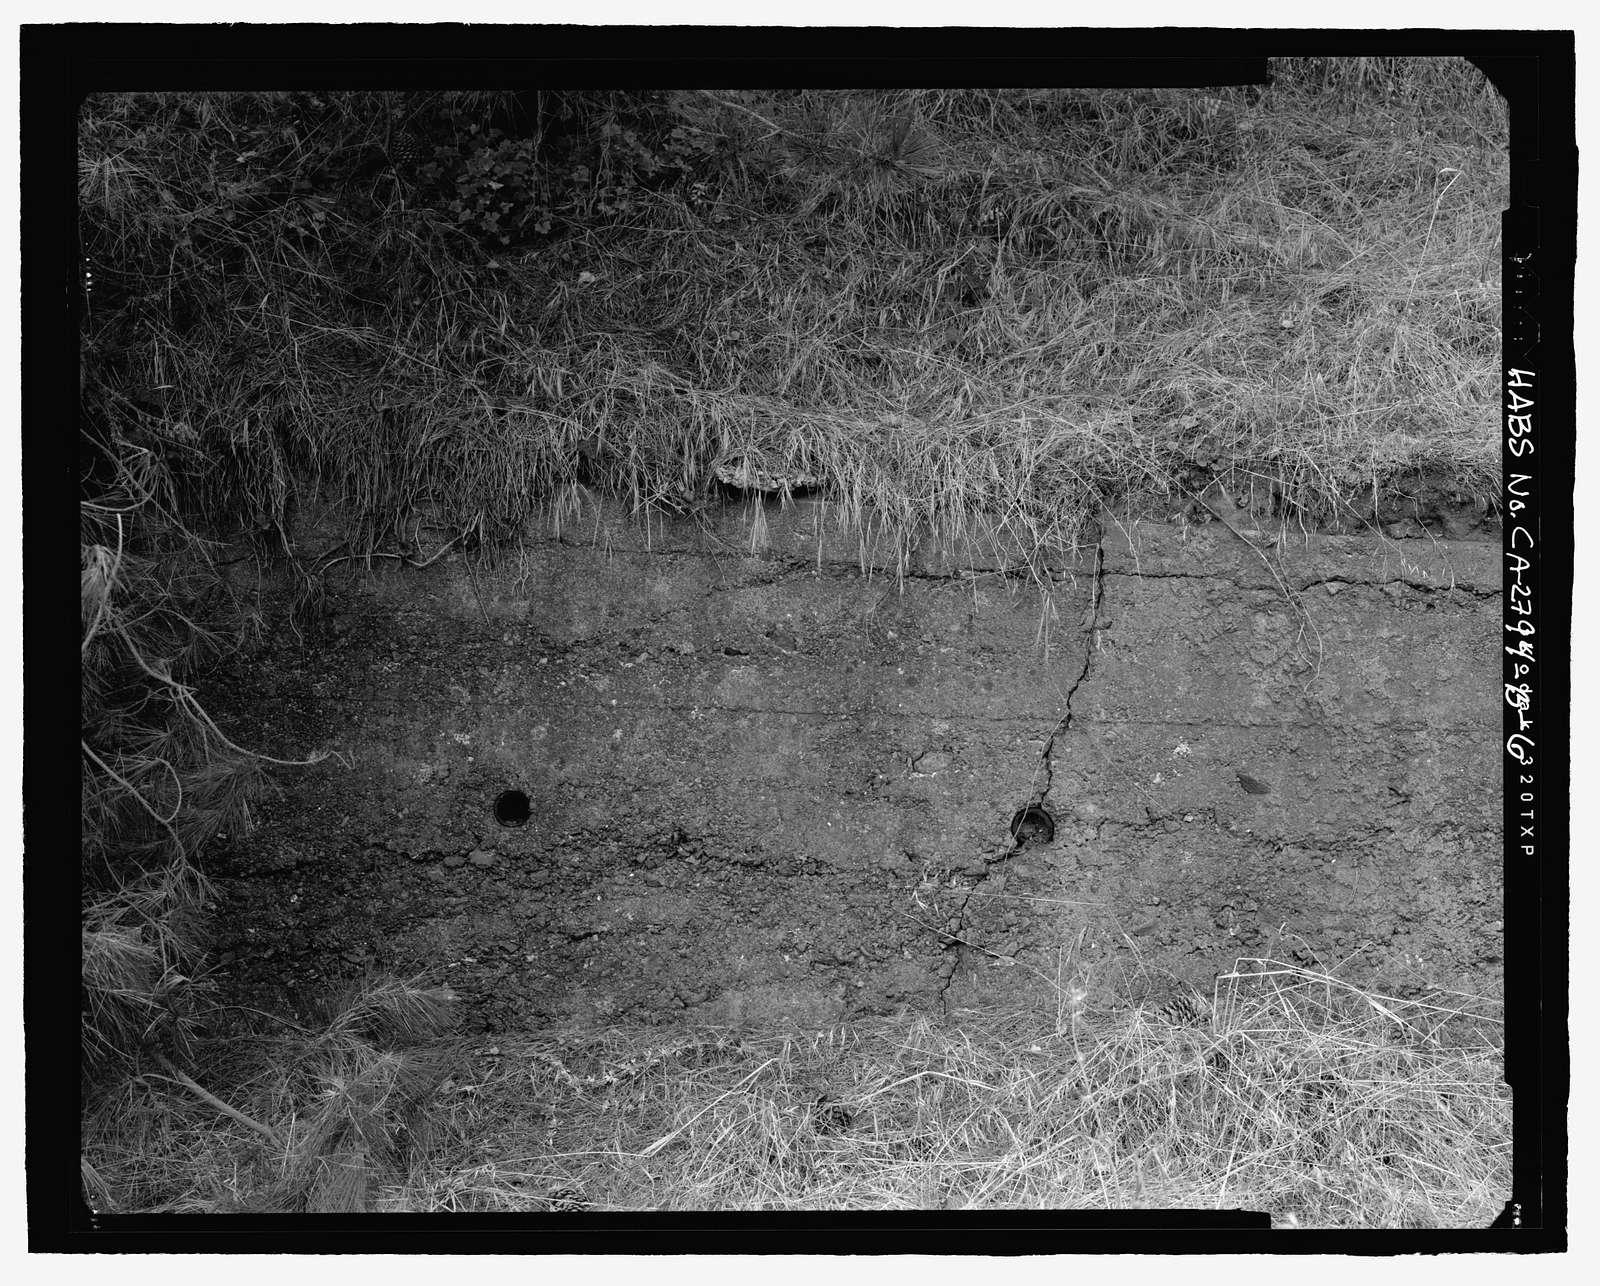 Fort Barry, Bonita Ridge Access Road, Retaining Wall, Point Bonita, Marin Headlands, Sausalito, Marin County, CA